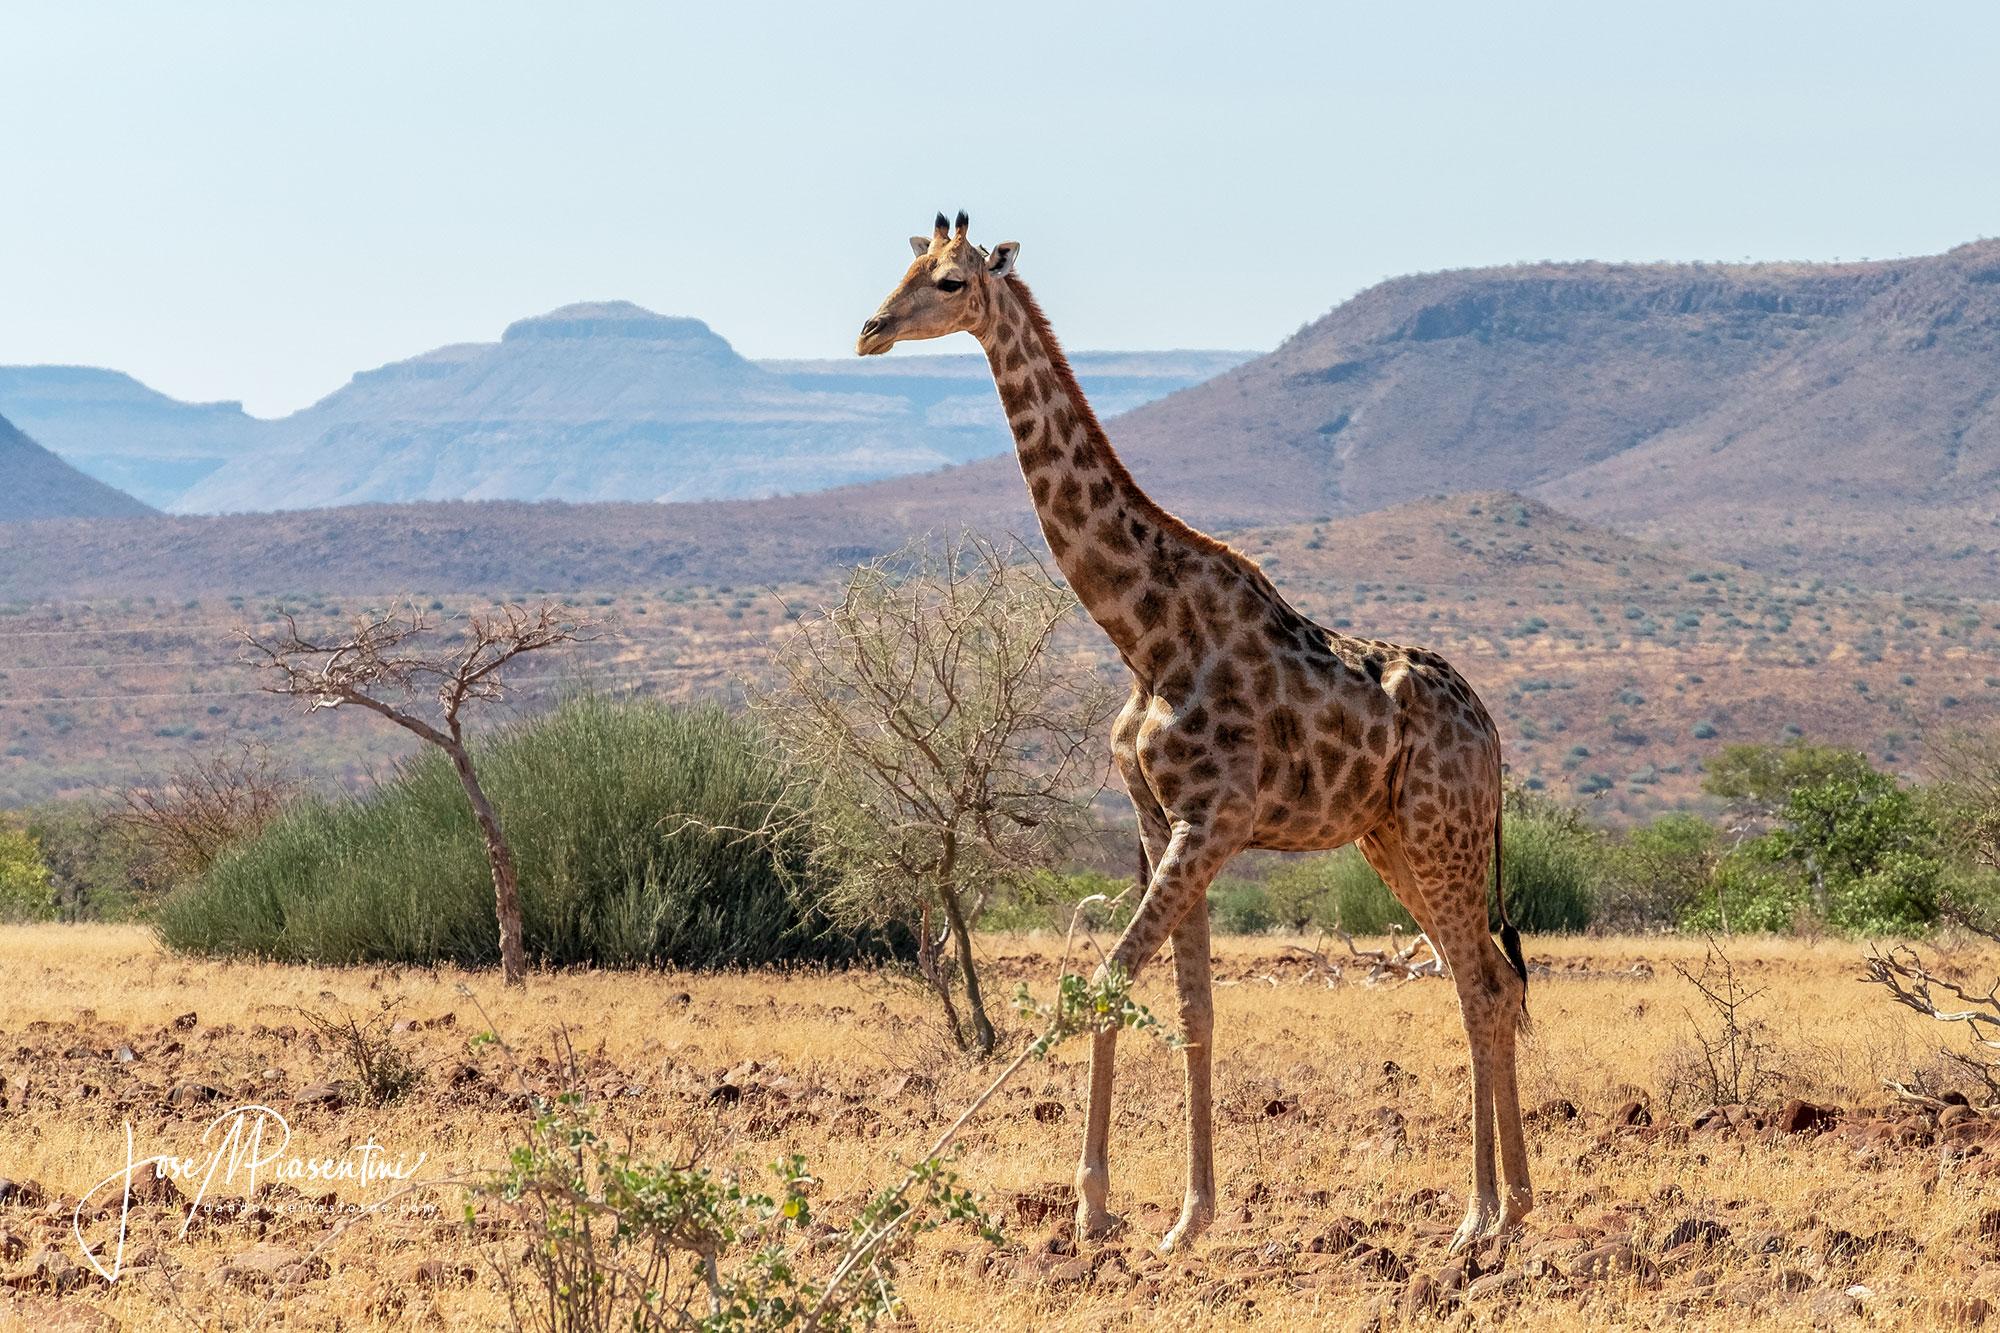 damaraland-Camino-Twyfelfontein wildlife